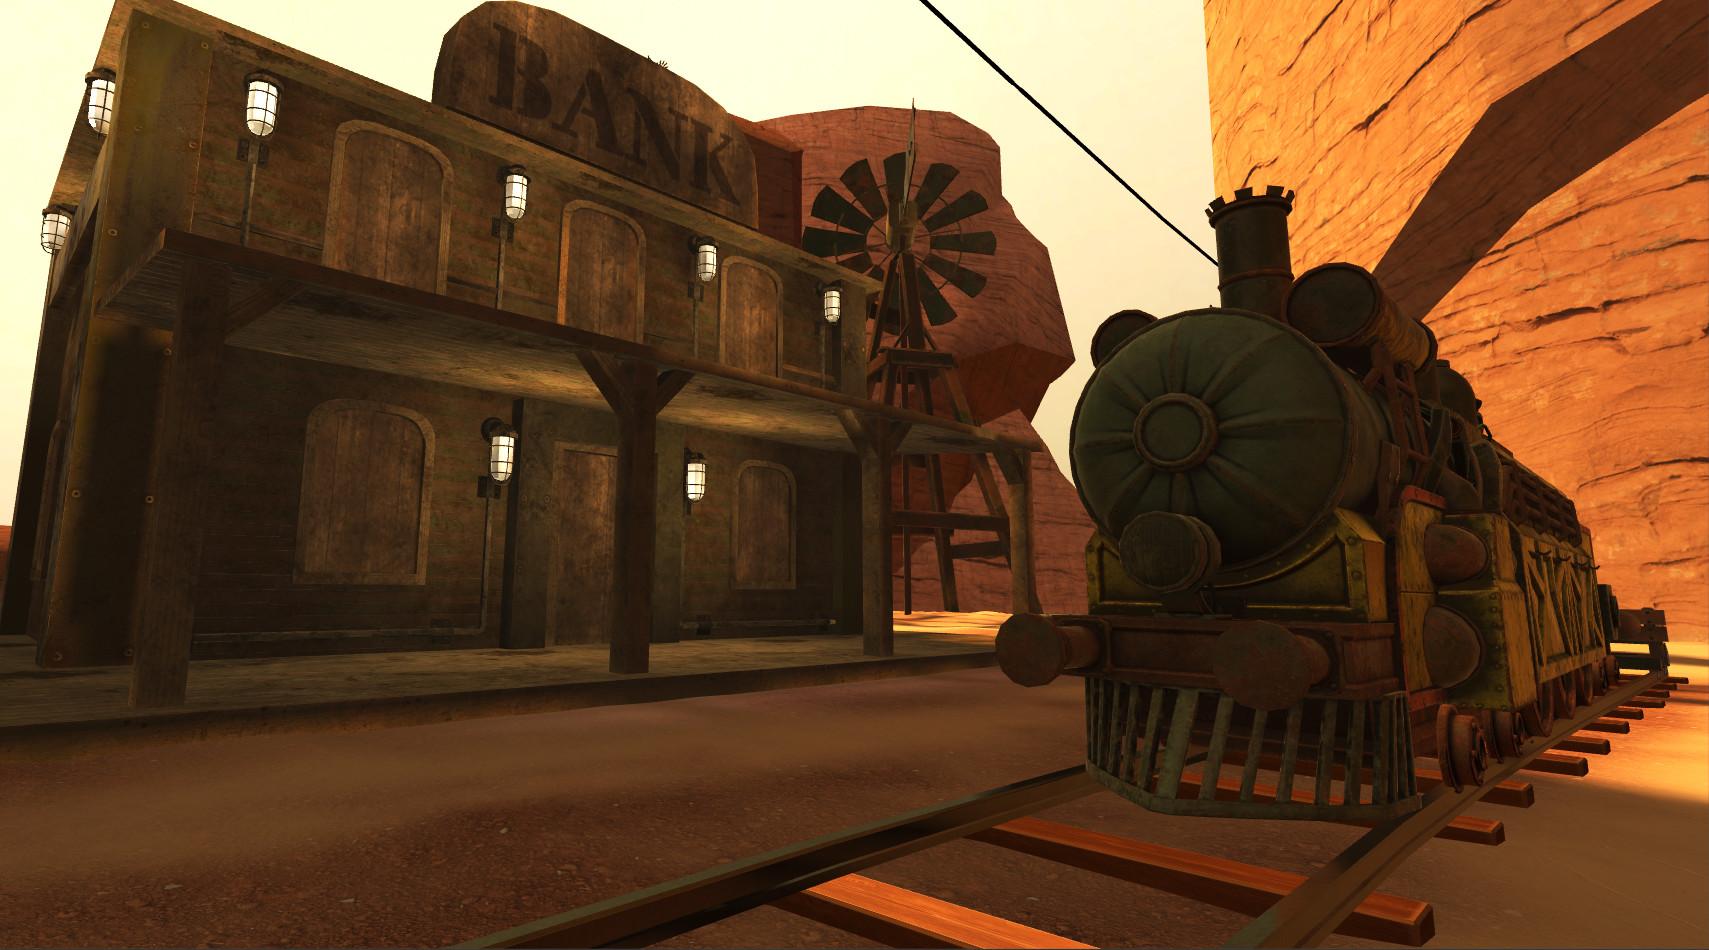 Oculus Quest 游戏《Cave Digger: Riches》地下挖矿者插图